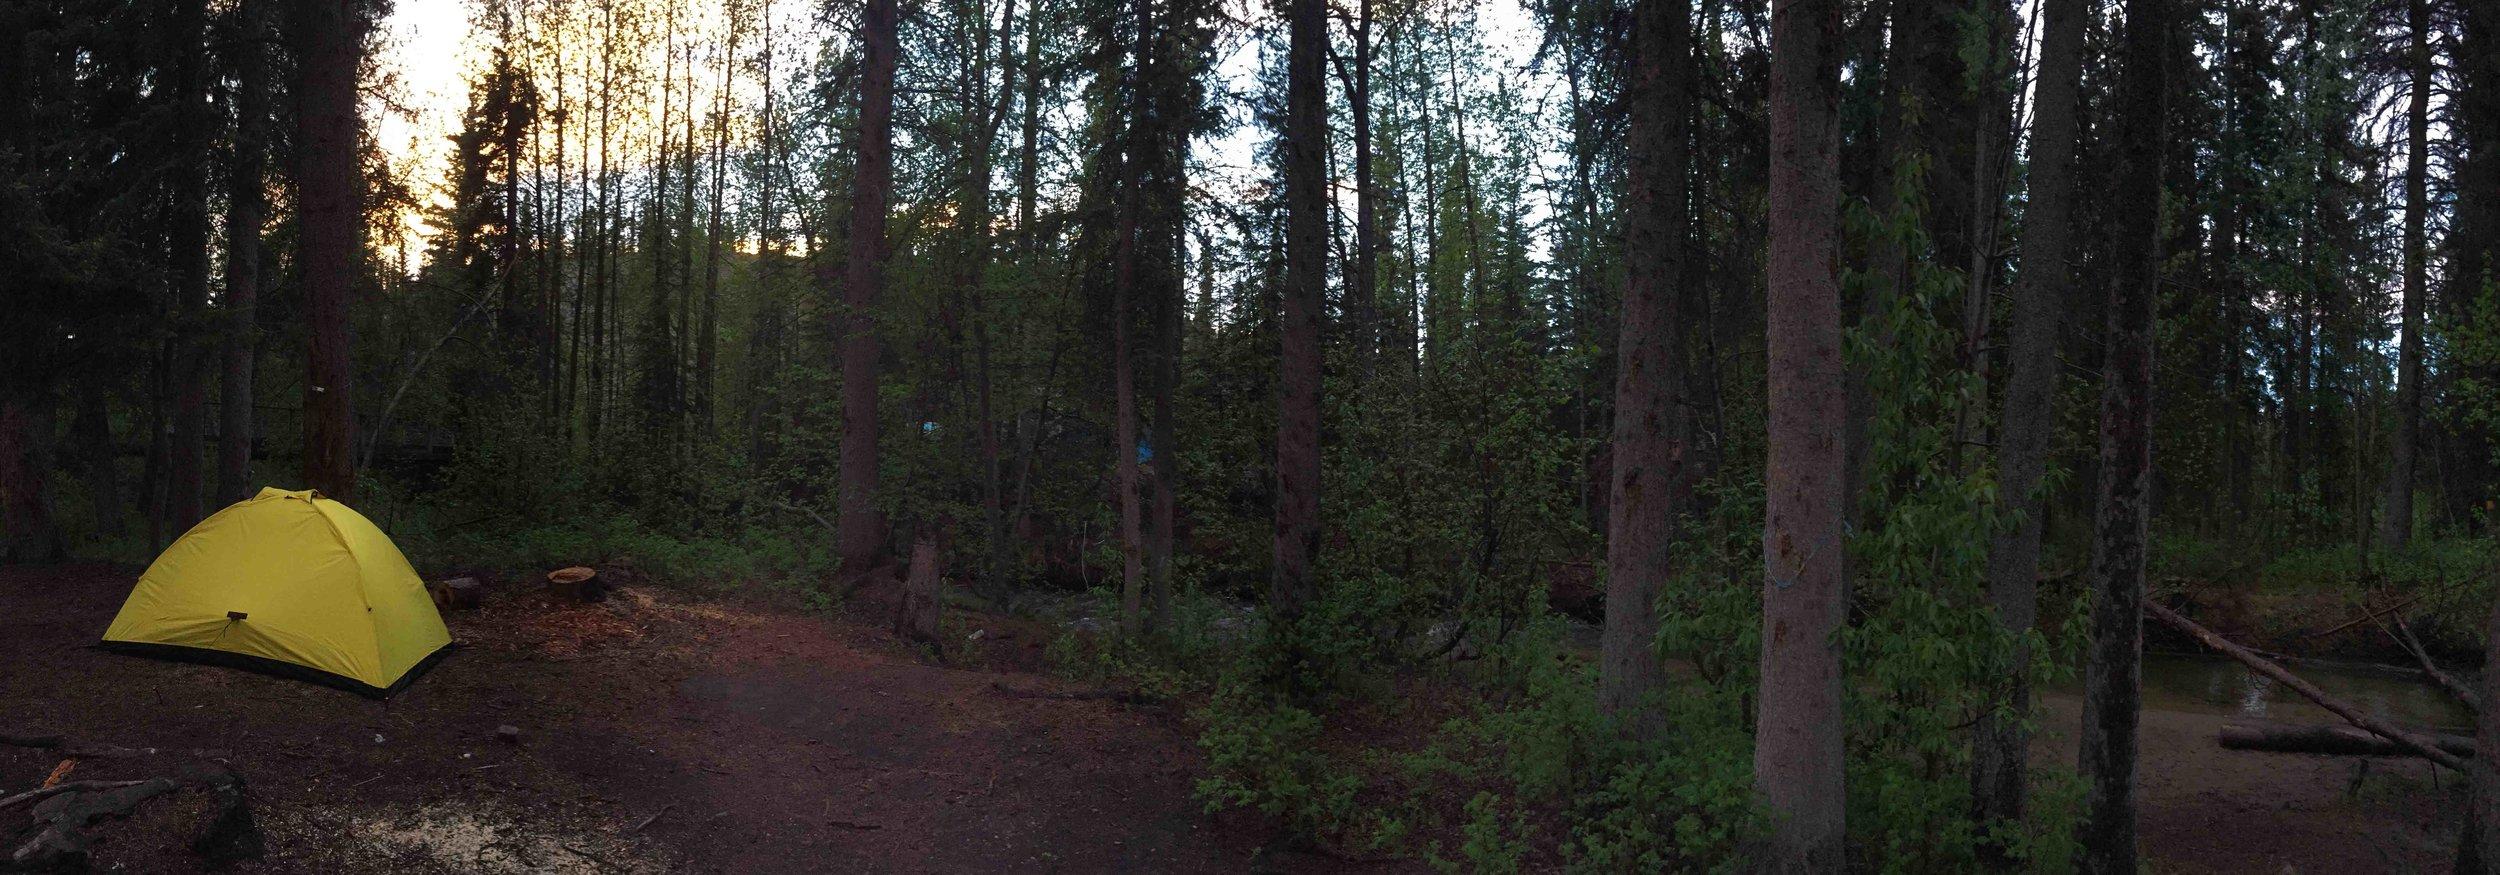 Wolfcreek Campground